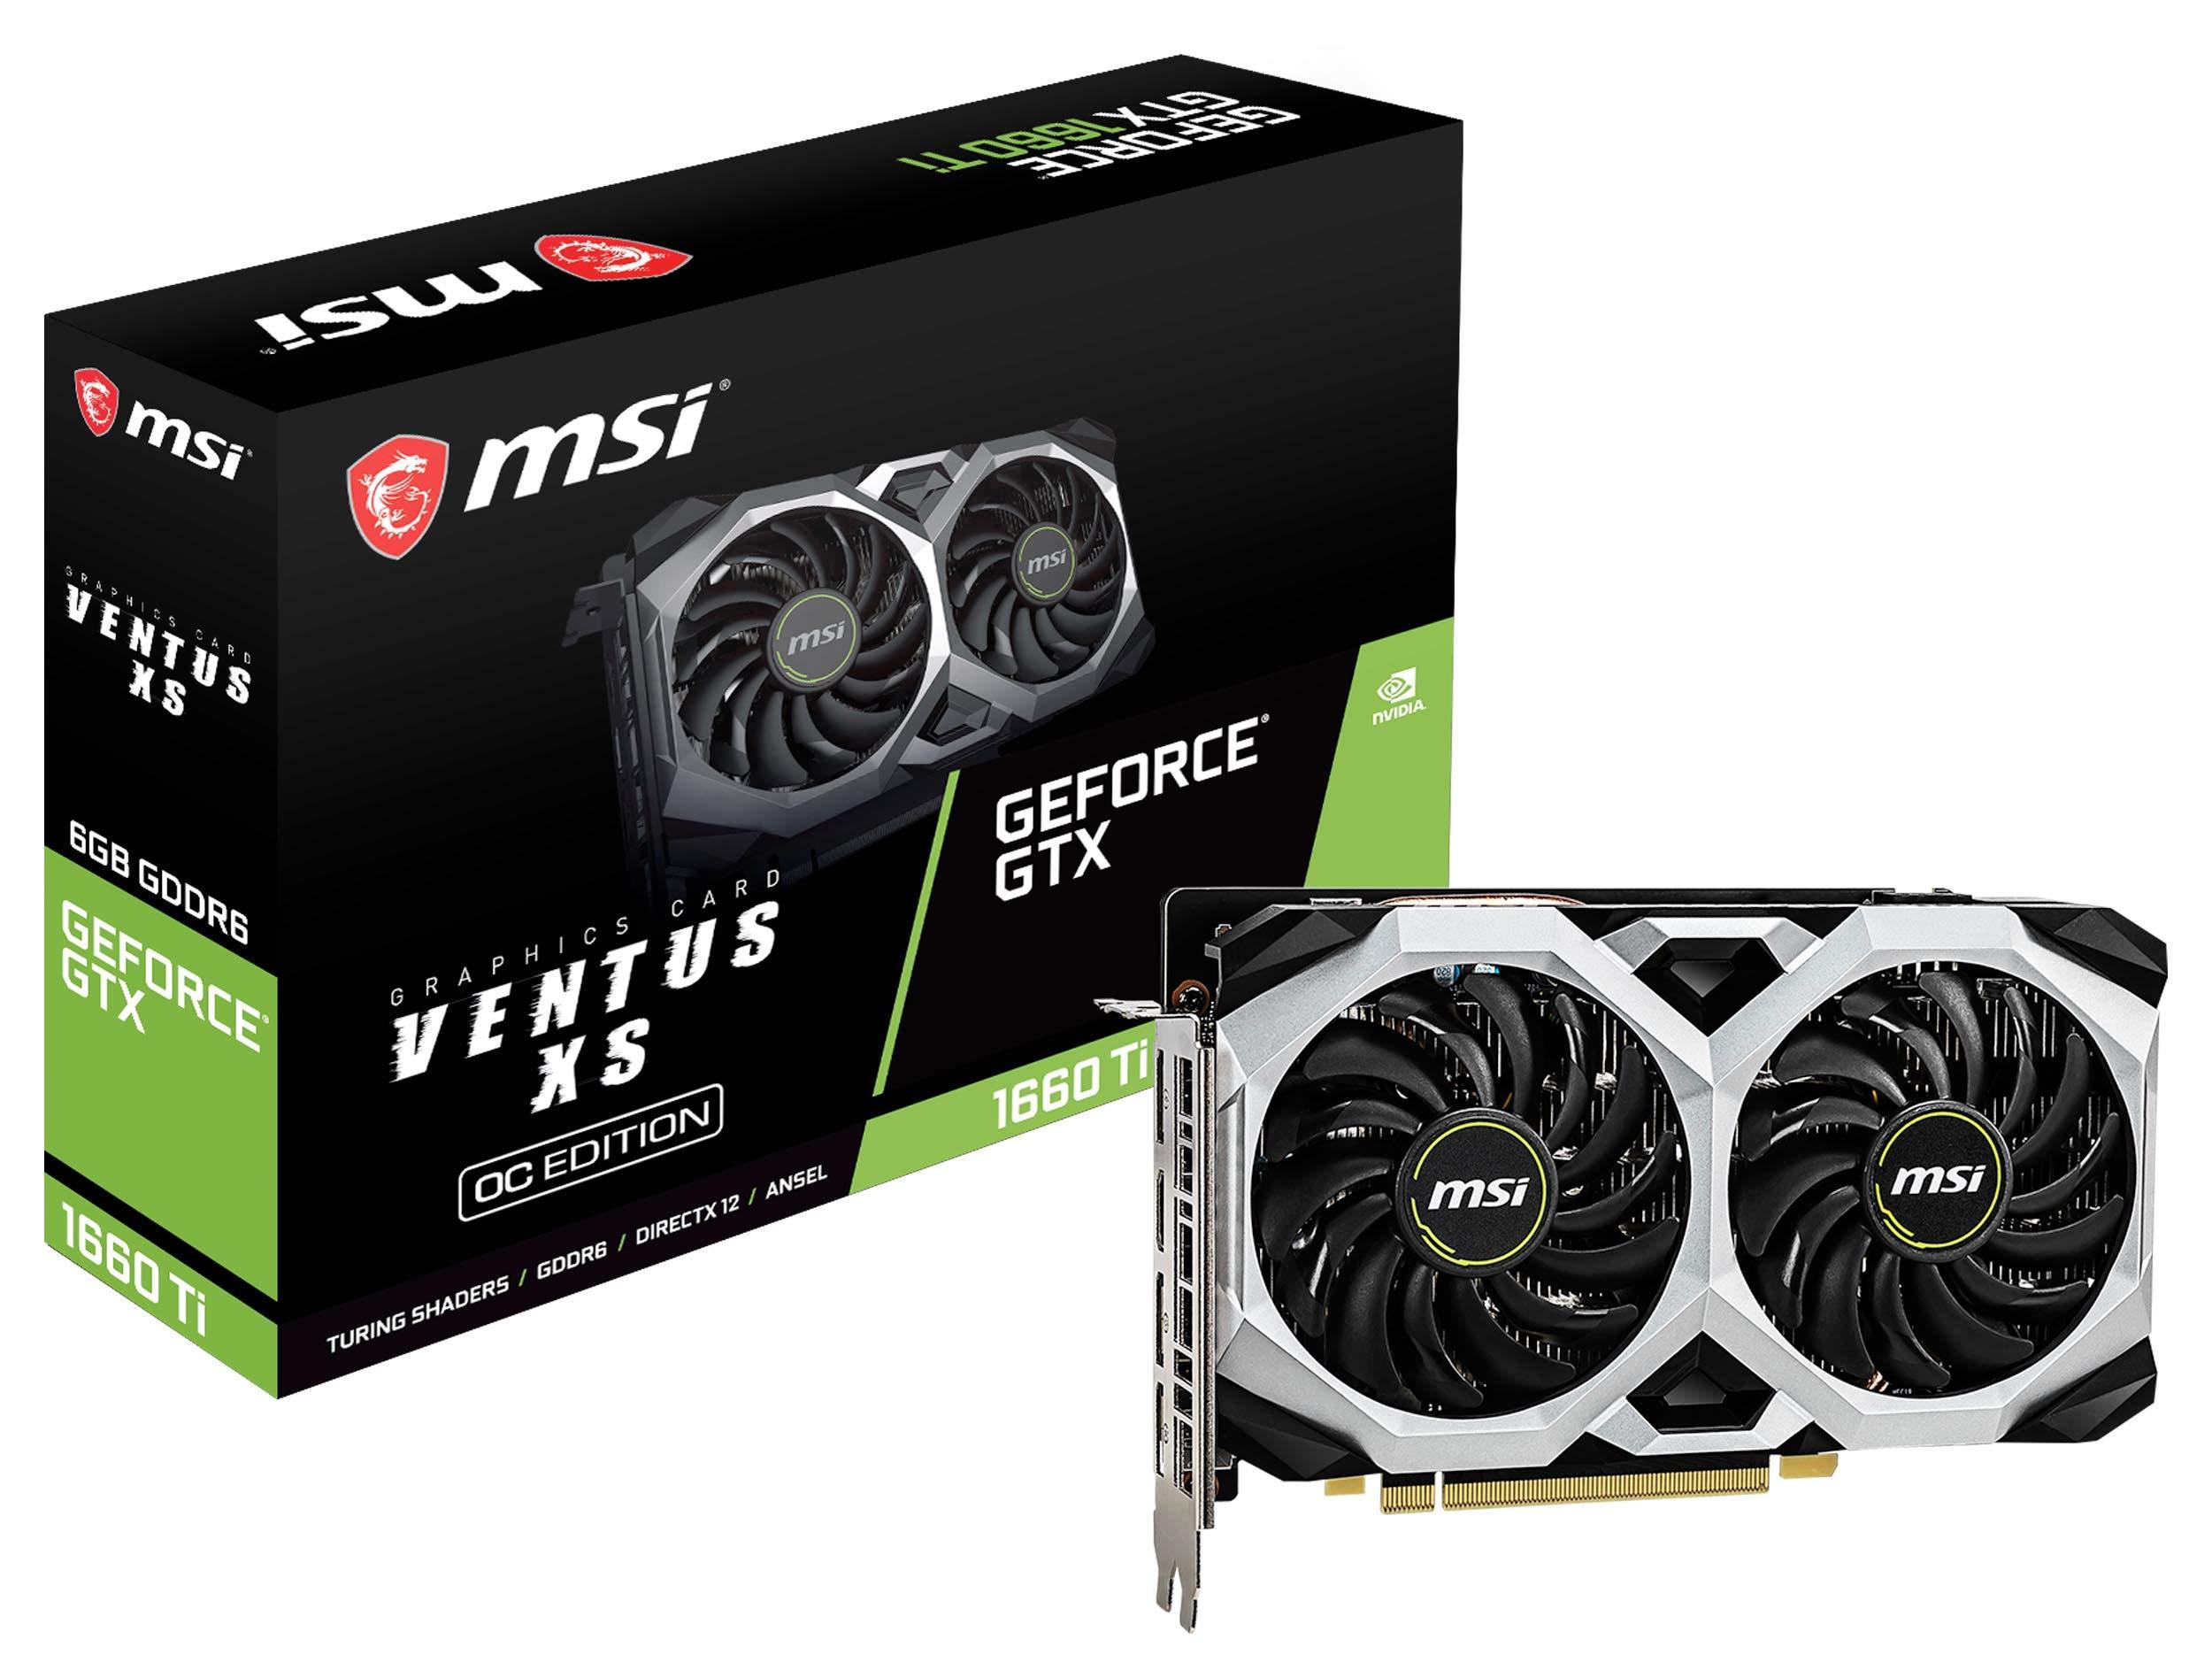 MSI Gaming GeForce GTX 1660 Ti 192-bit HDMI/DP 6GB GDRR6 HDCP Support DirectX 12 Dual Fan VR Ready OC Graphics Card (GTX 1660 TI Ventus XS 6G OC) by MSI (Image #1)